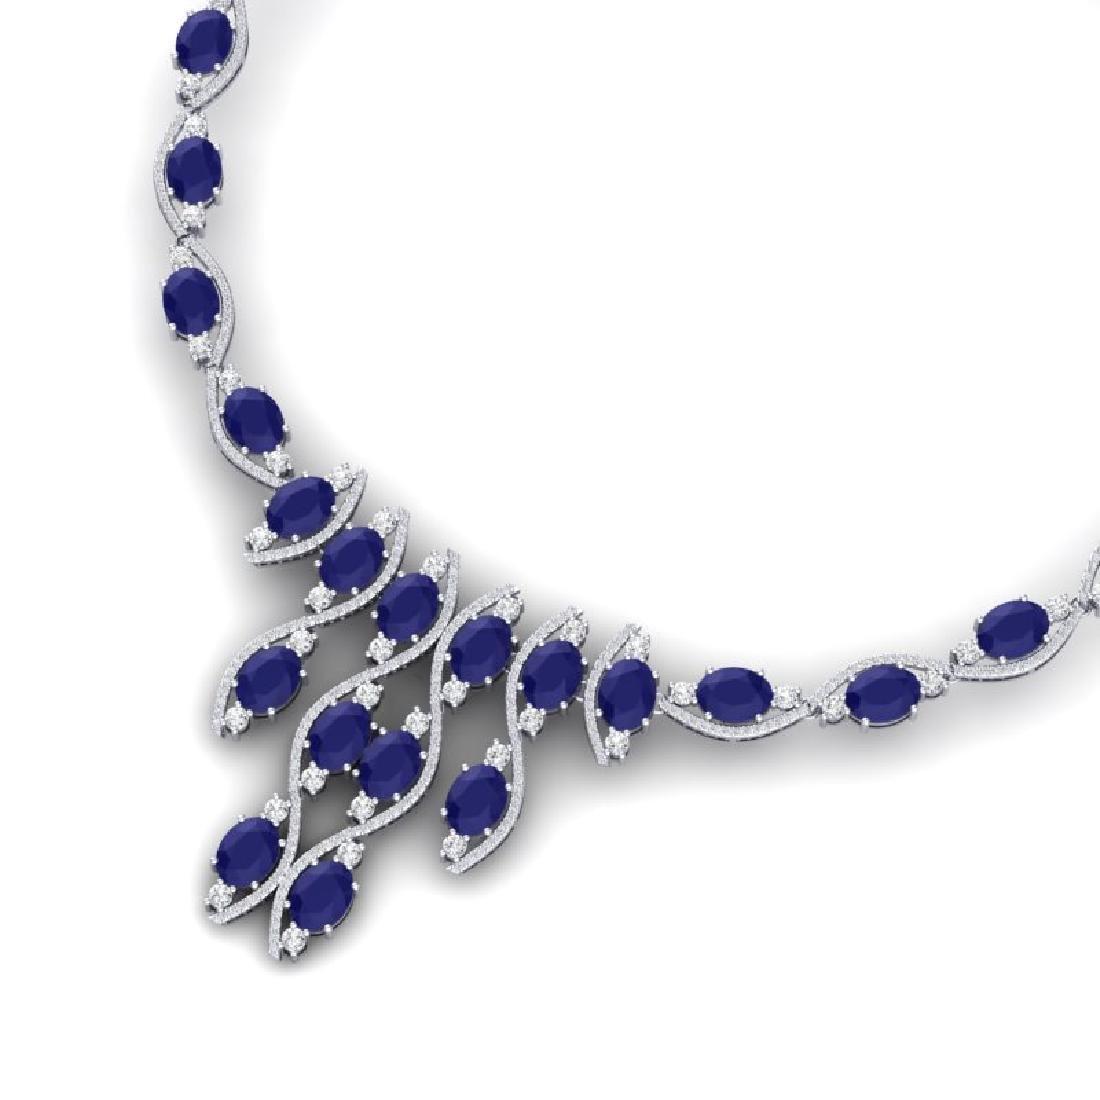 65.93 CTW Royalty Sapphire & VS Diamond Necklace 18K